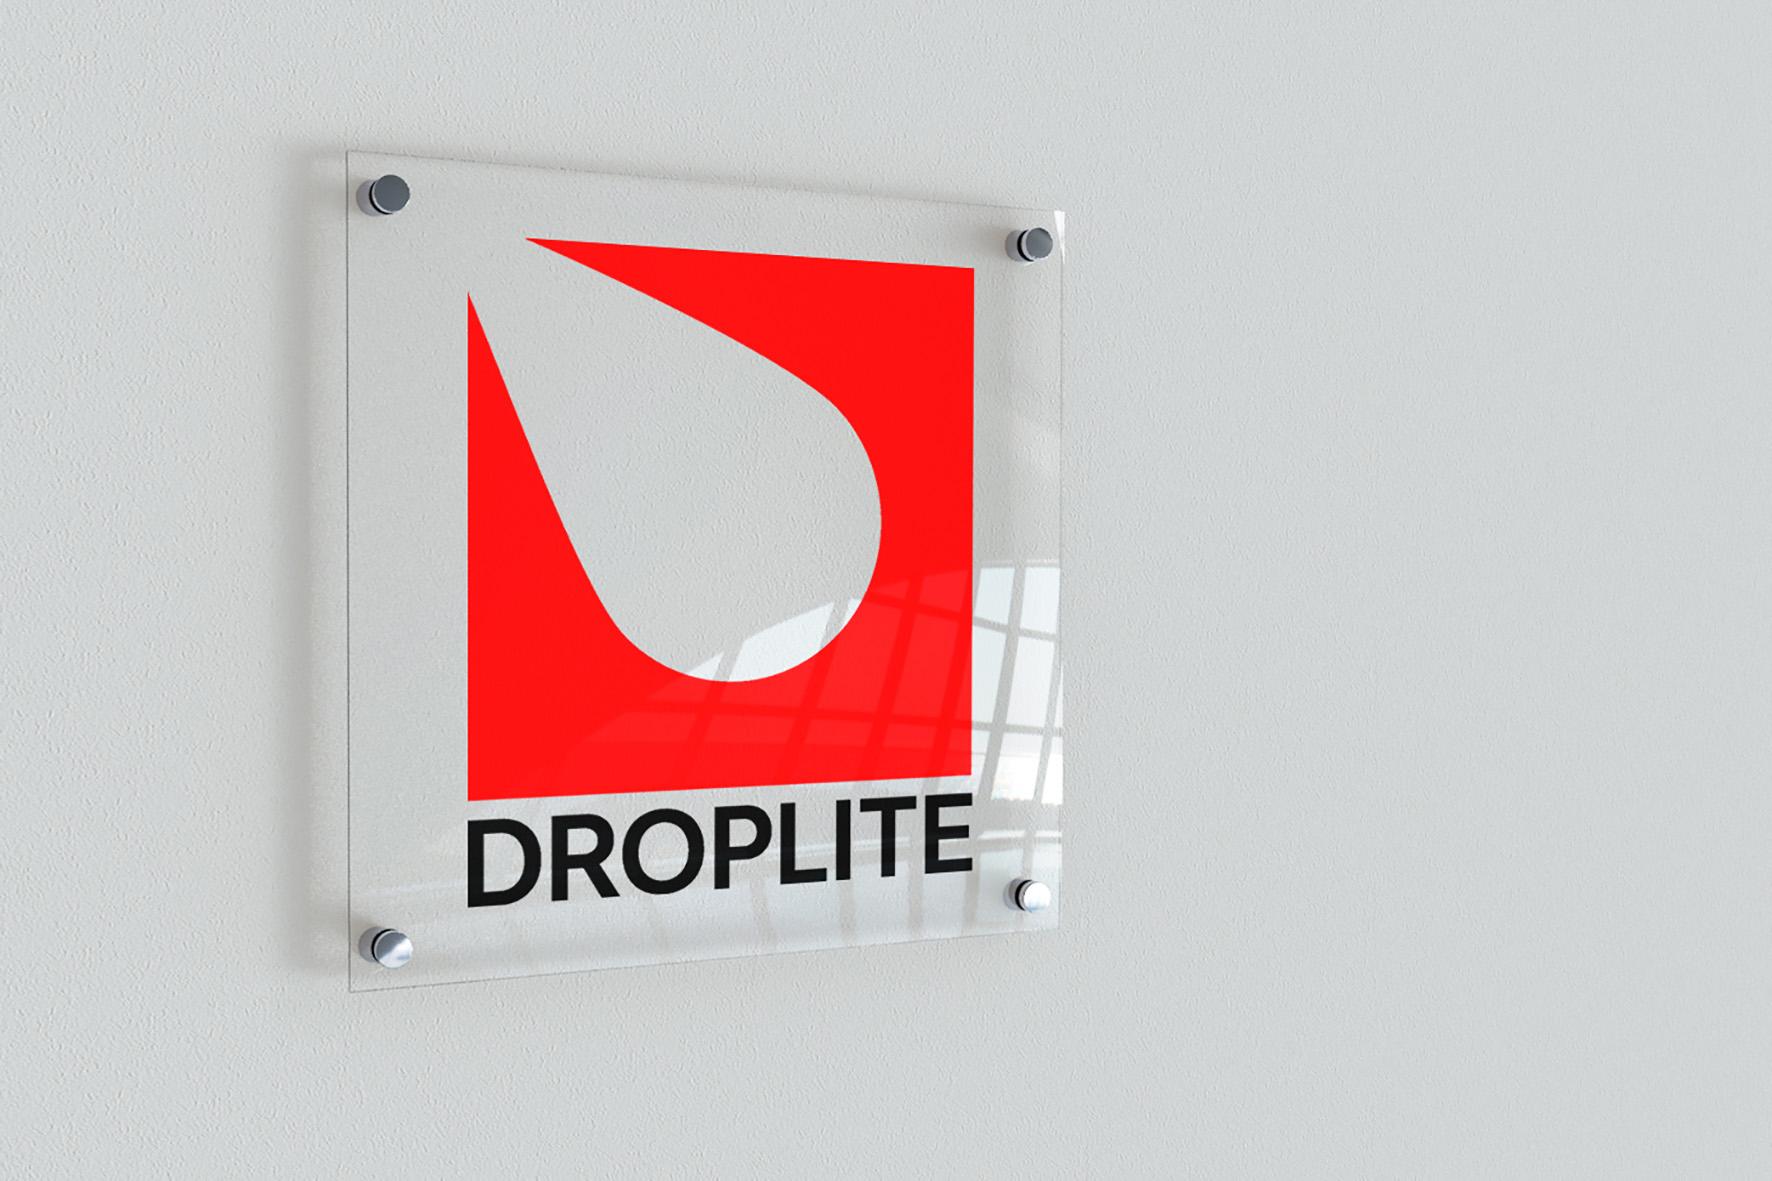 Bitflow-studio-droplite-logo-design-technology-startup-4